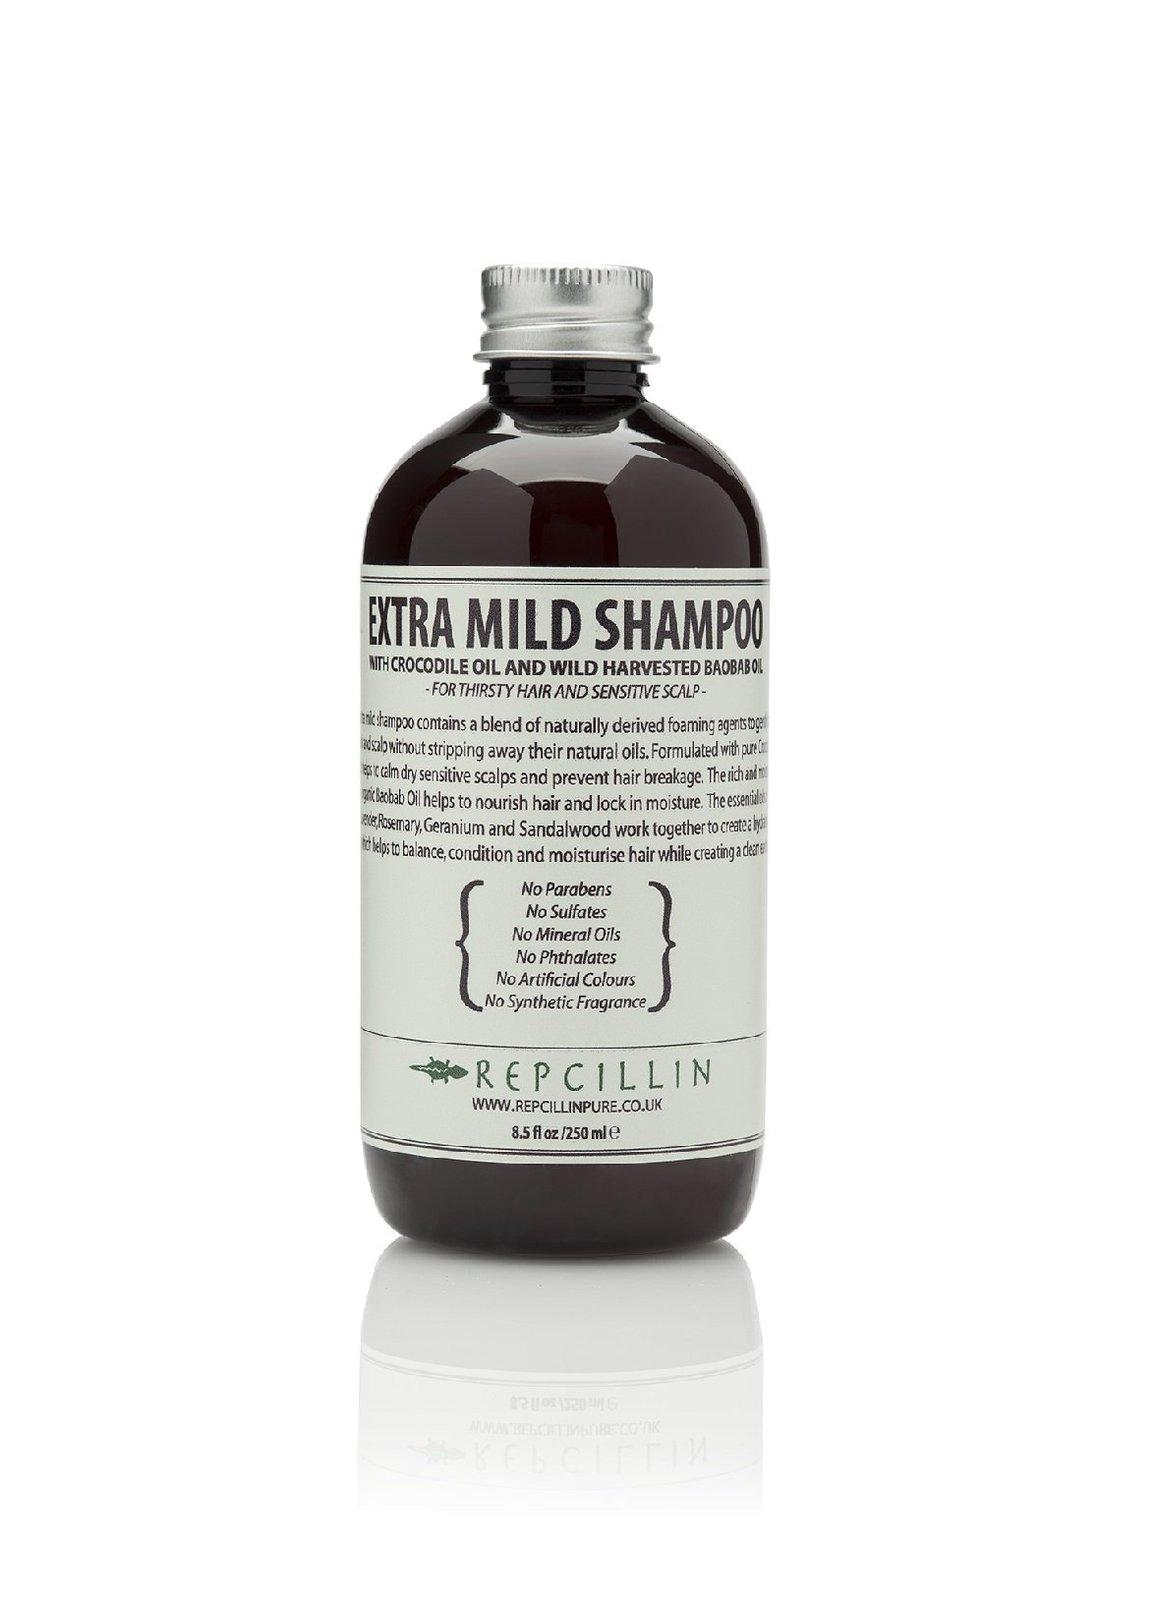 Repcillin Extra Mild Shampoo with Crocodile Oil and Wild Harvested Baobab Oil...